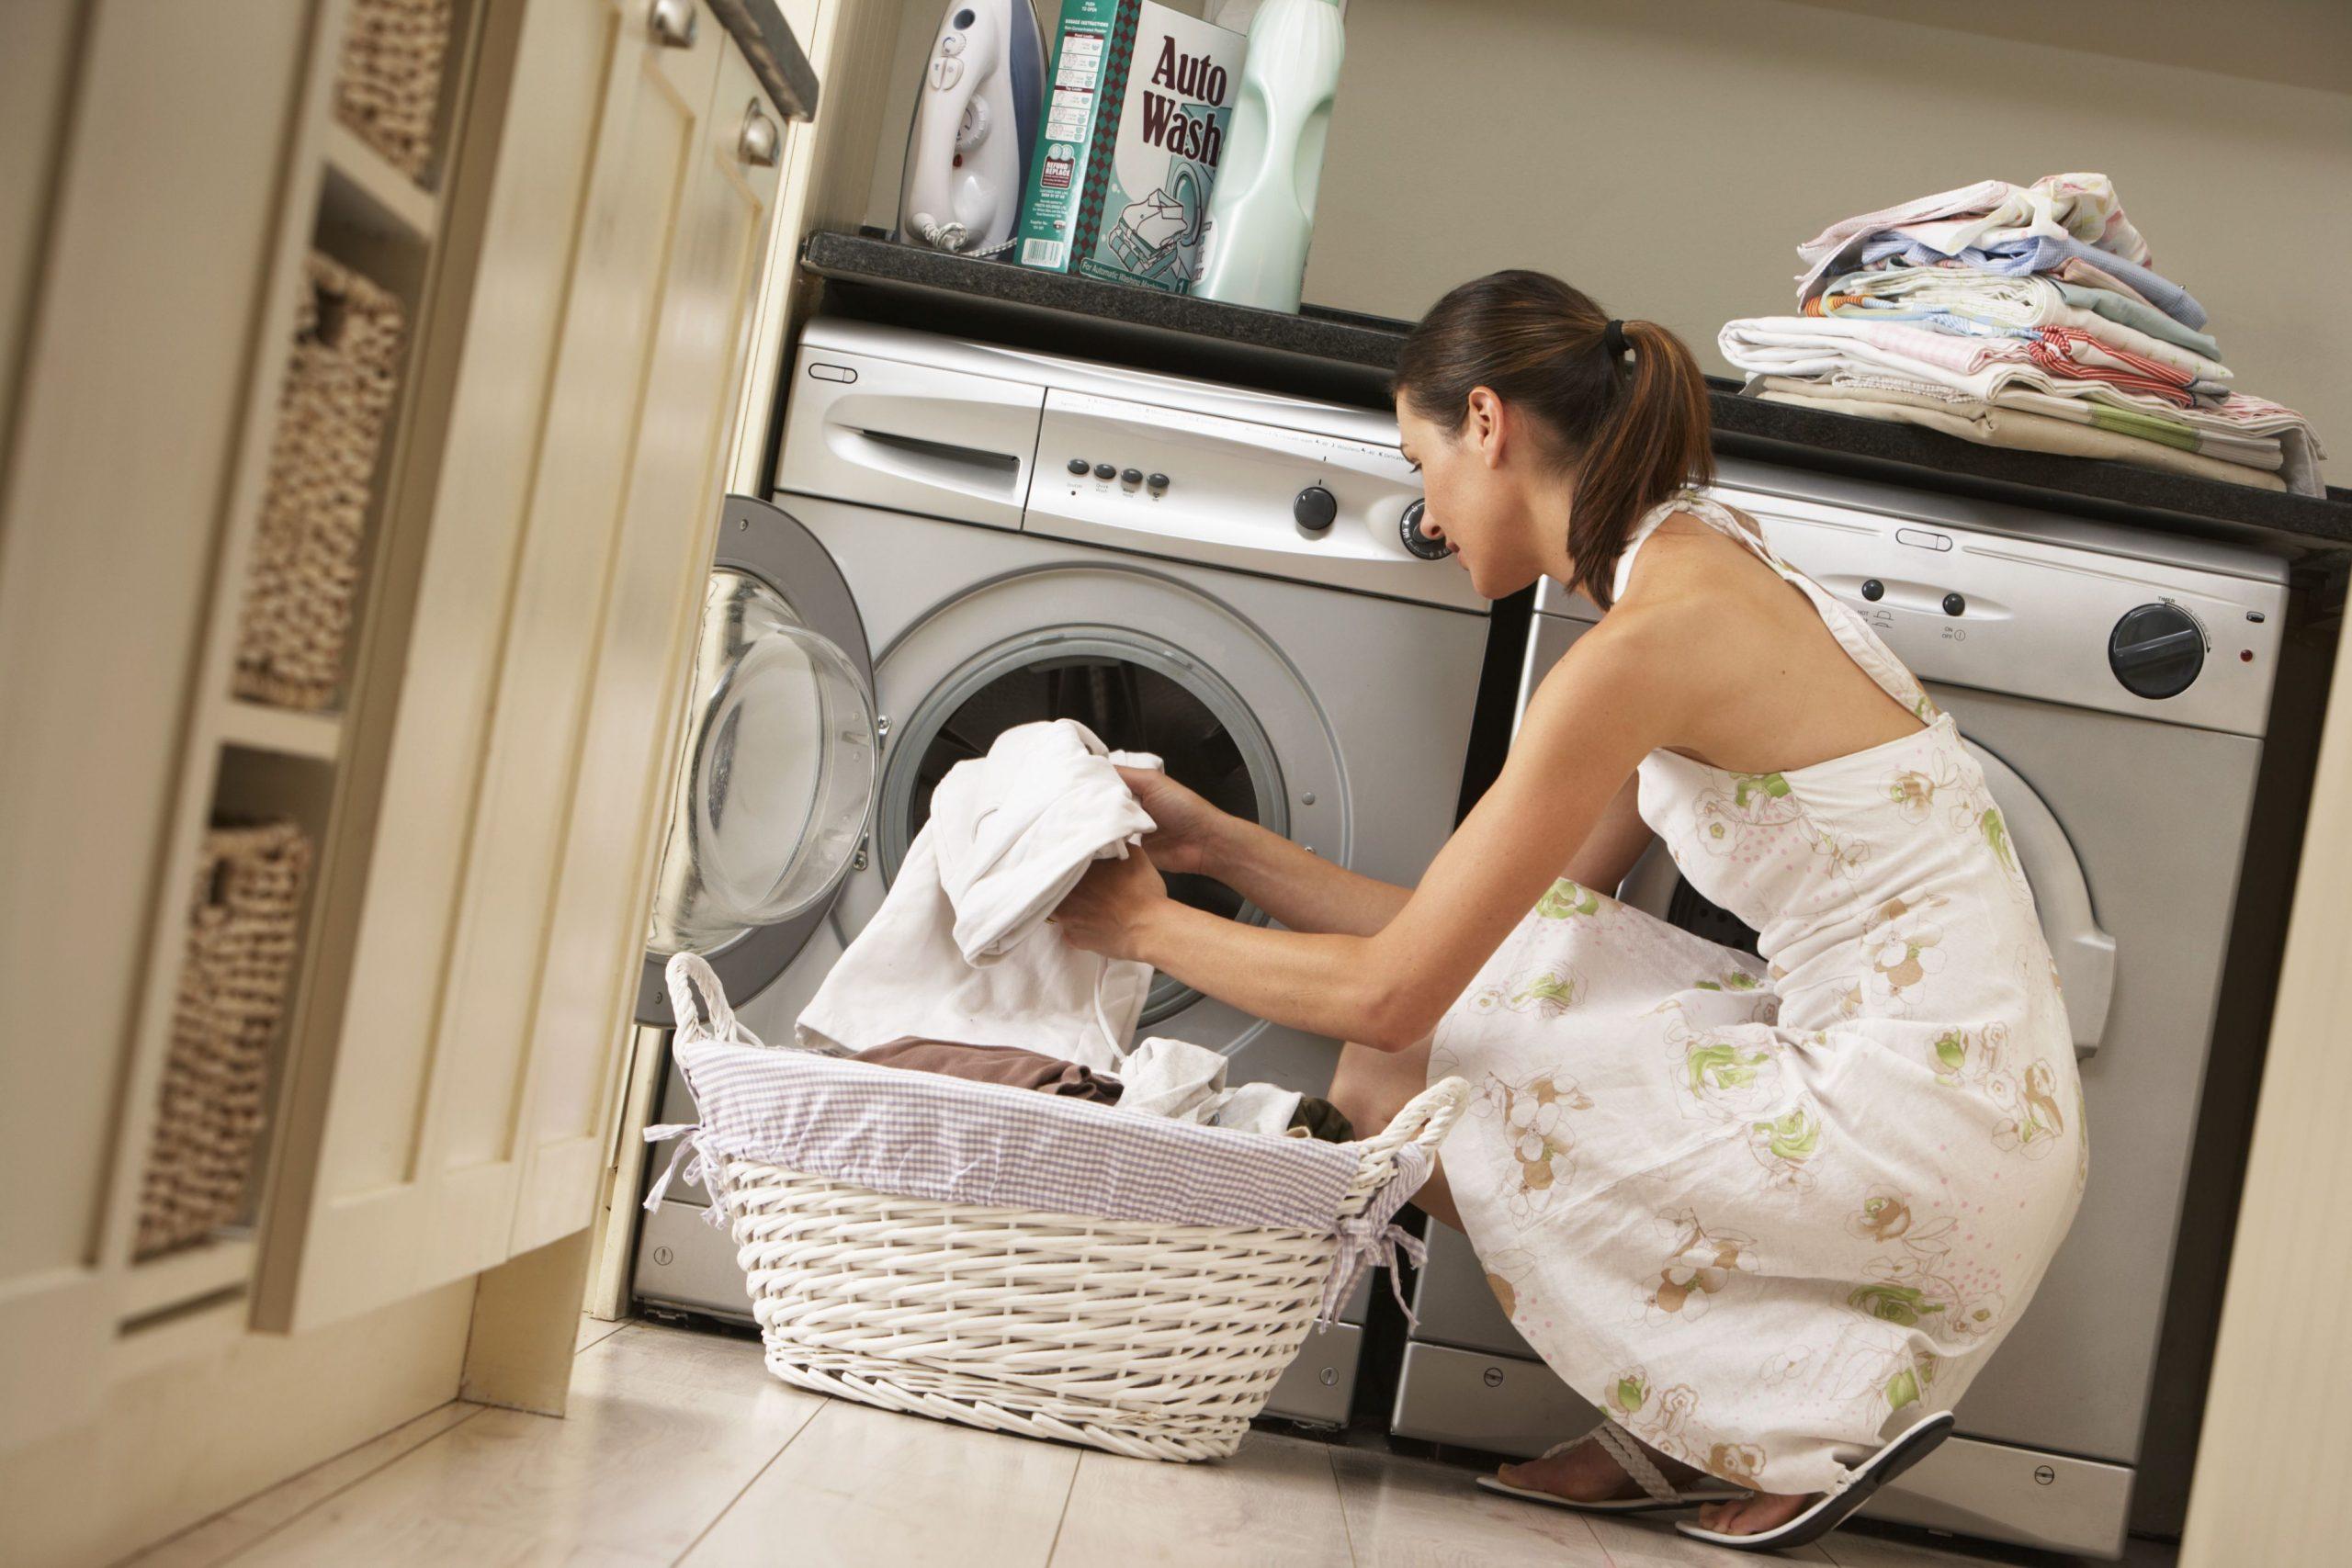 Woman loading her washing machine.